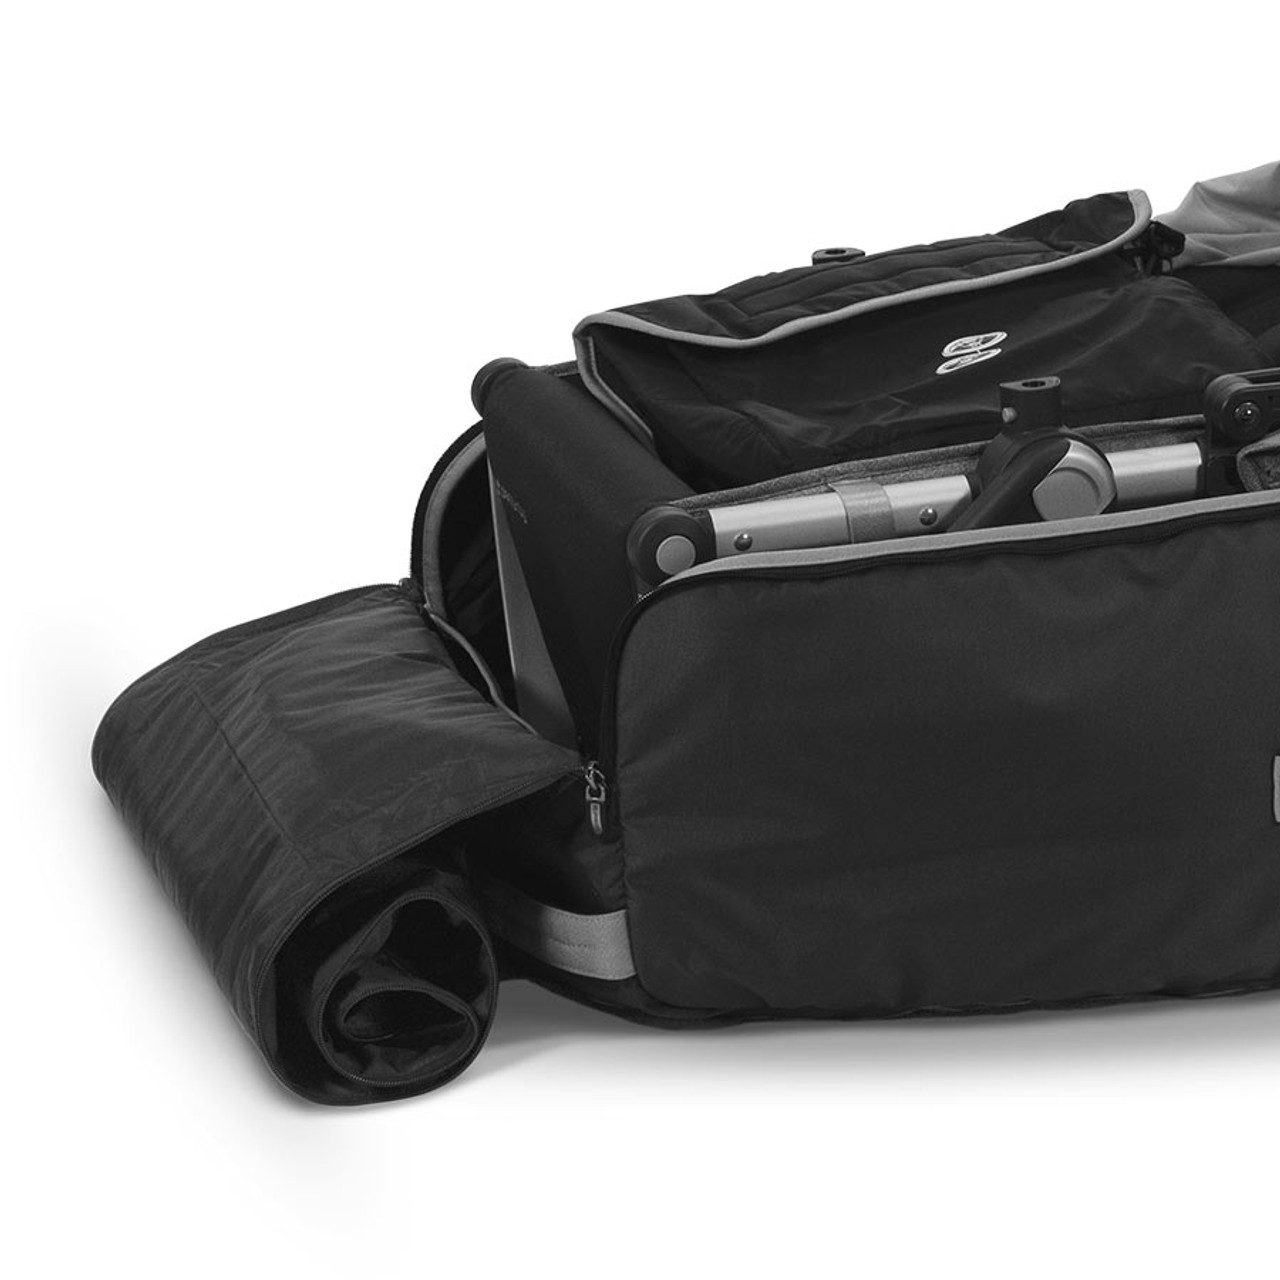 UPPAbaby Travel Bag VISTA/VISTA V2, CRUZ/CRUZ V2 at Baby Barn Discounts Pack up your stroller and travel with ease! The UPPAbaby Travel Bag and TravelSafe Program insures your stroller for air travel.